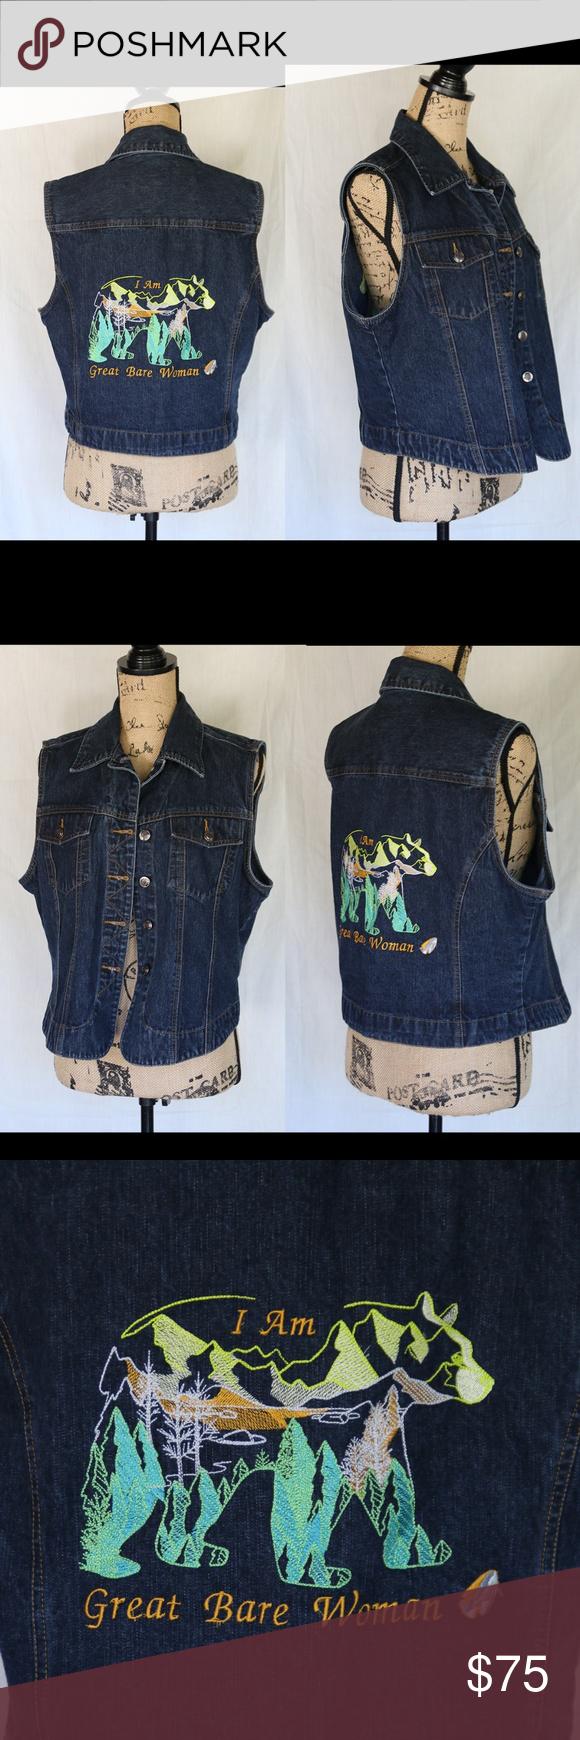 Women's Custom Jean Wild West Vest sz L Women's Custom Denim